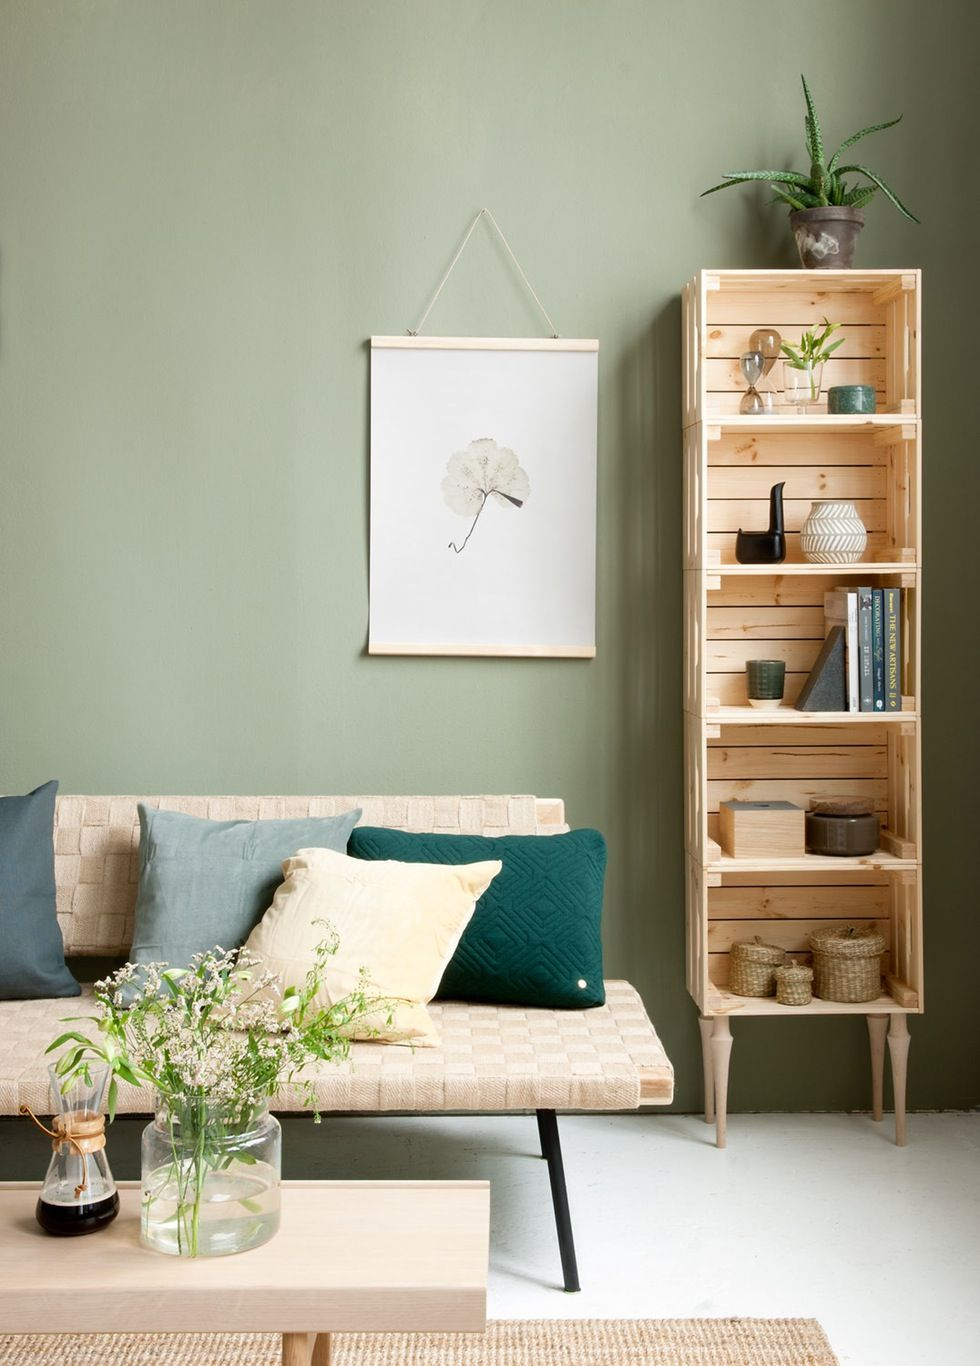 Diy inspiration crates bookshelf diy home ii for Bedroom shelves inspiration